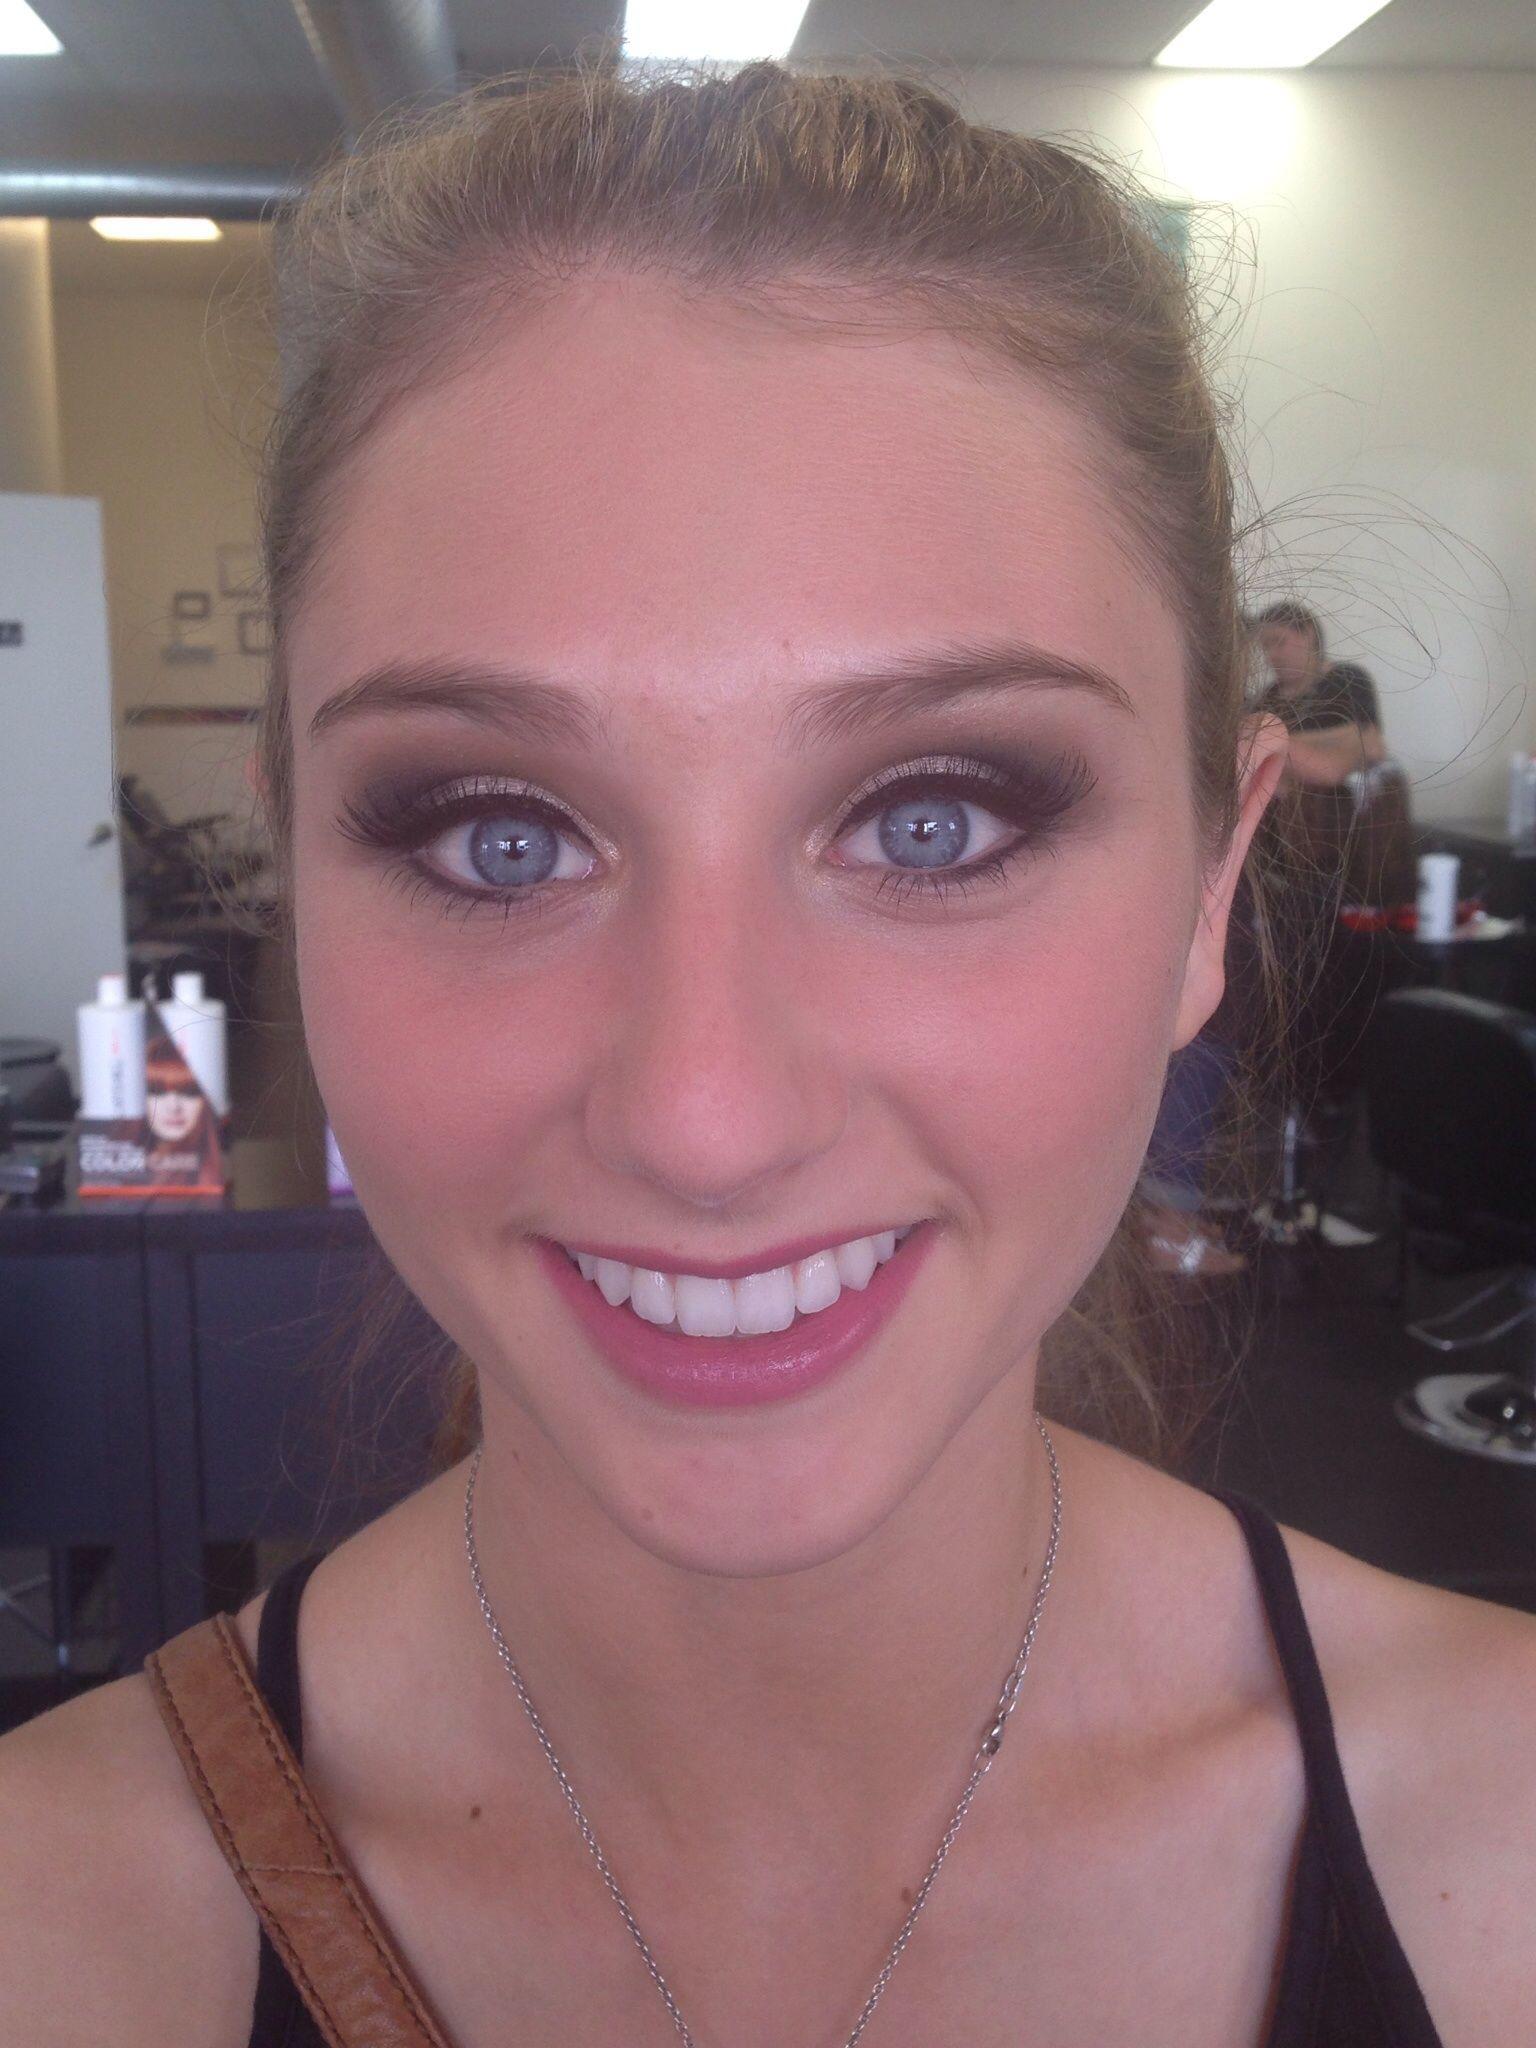 Senior picture makeup, smokey eye Makeup pictures